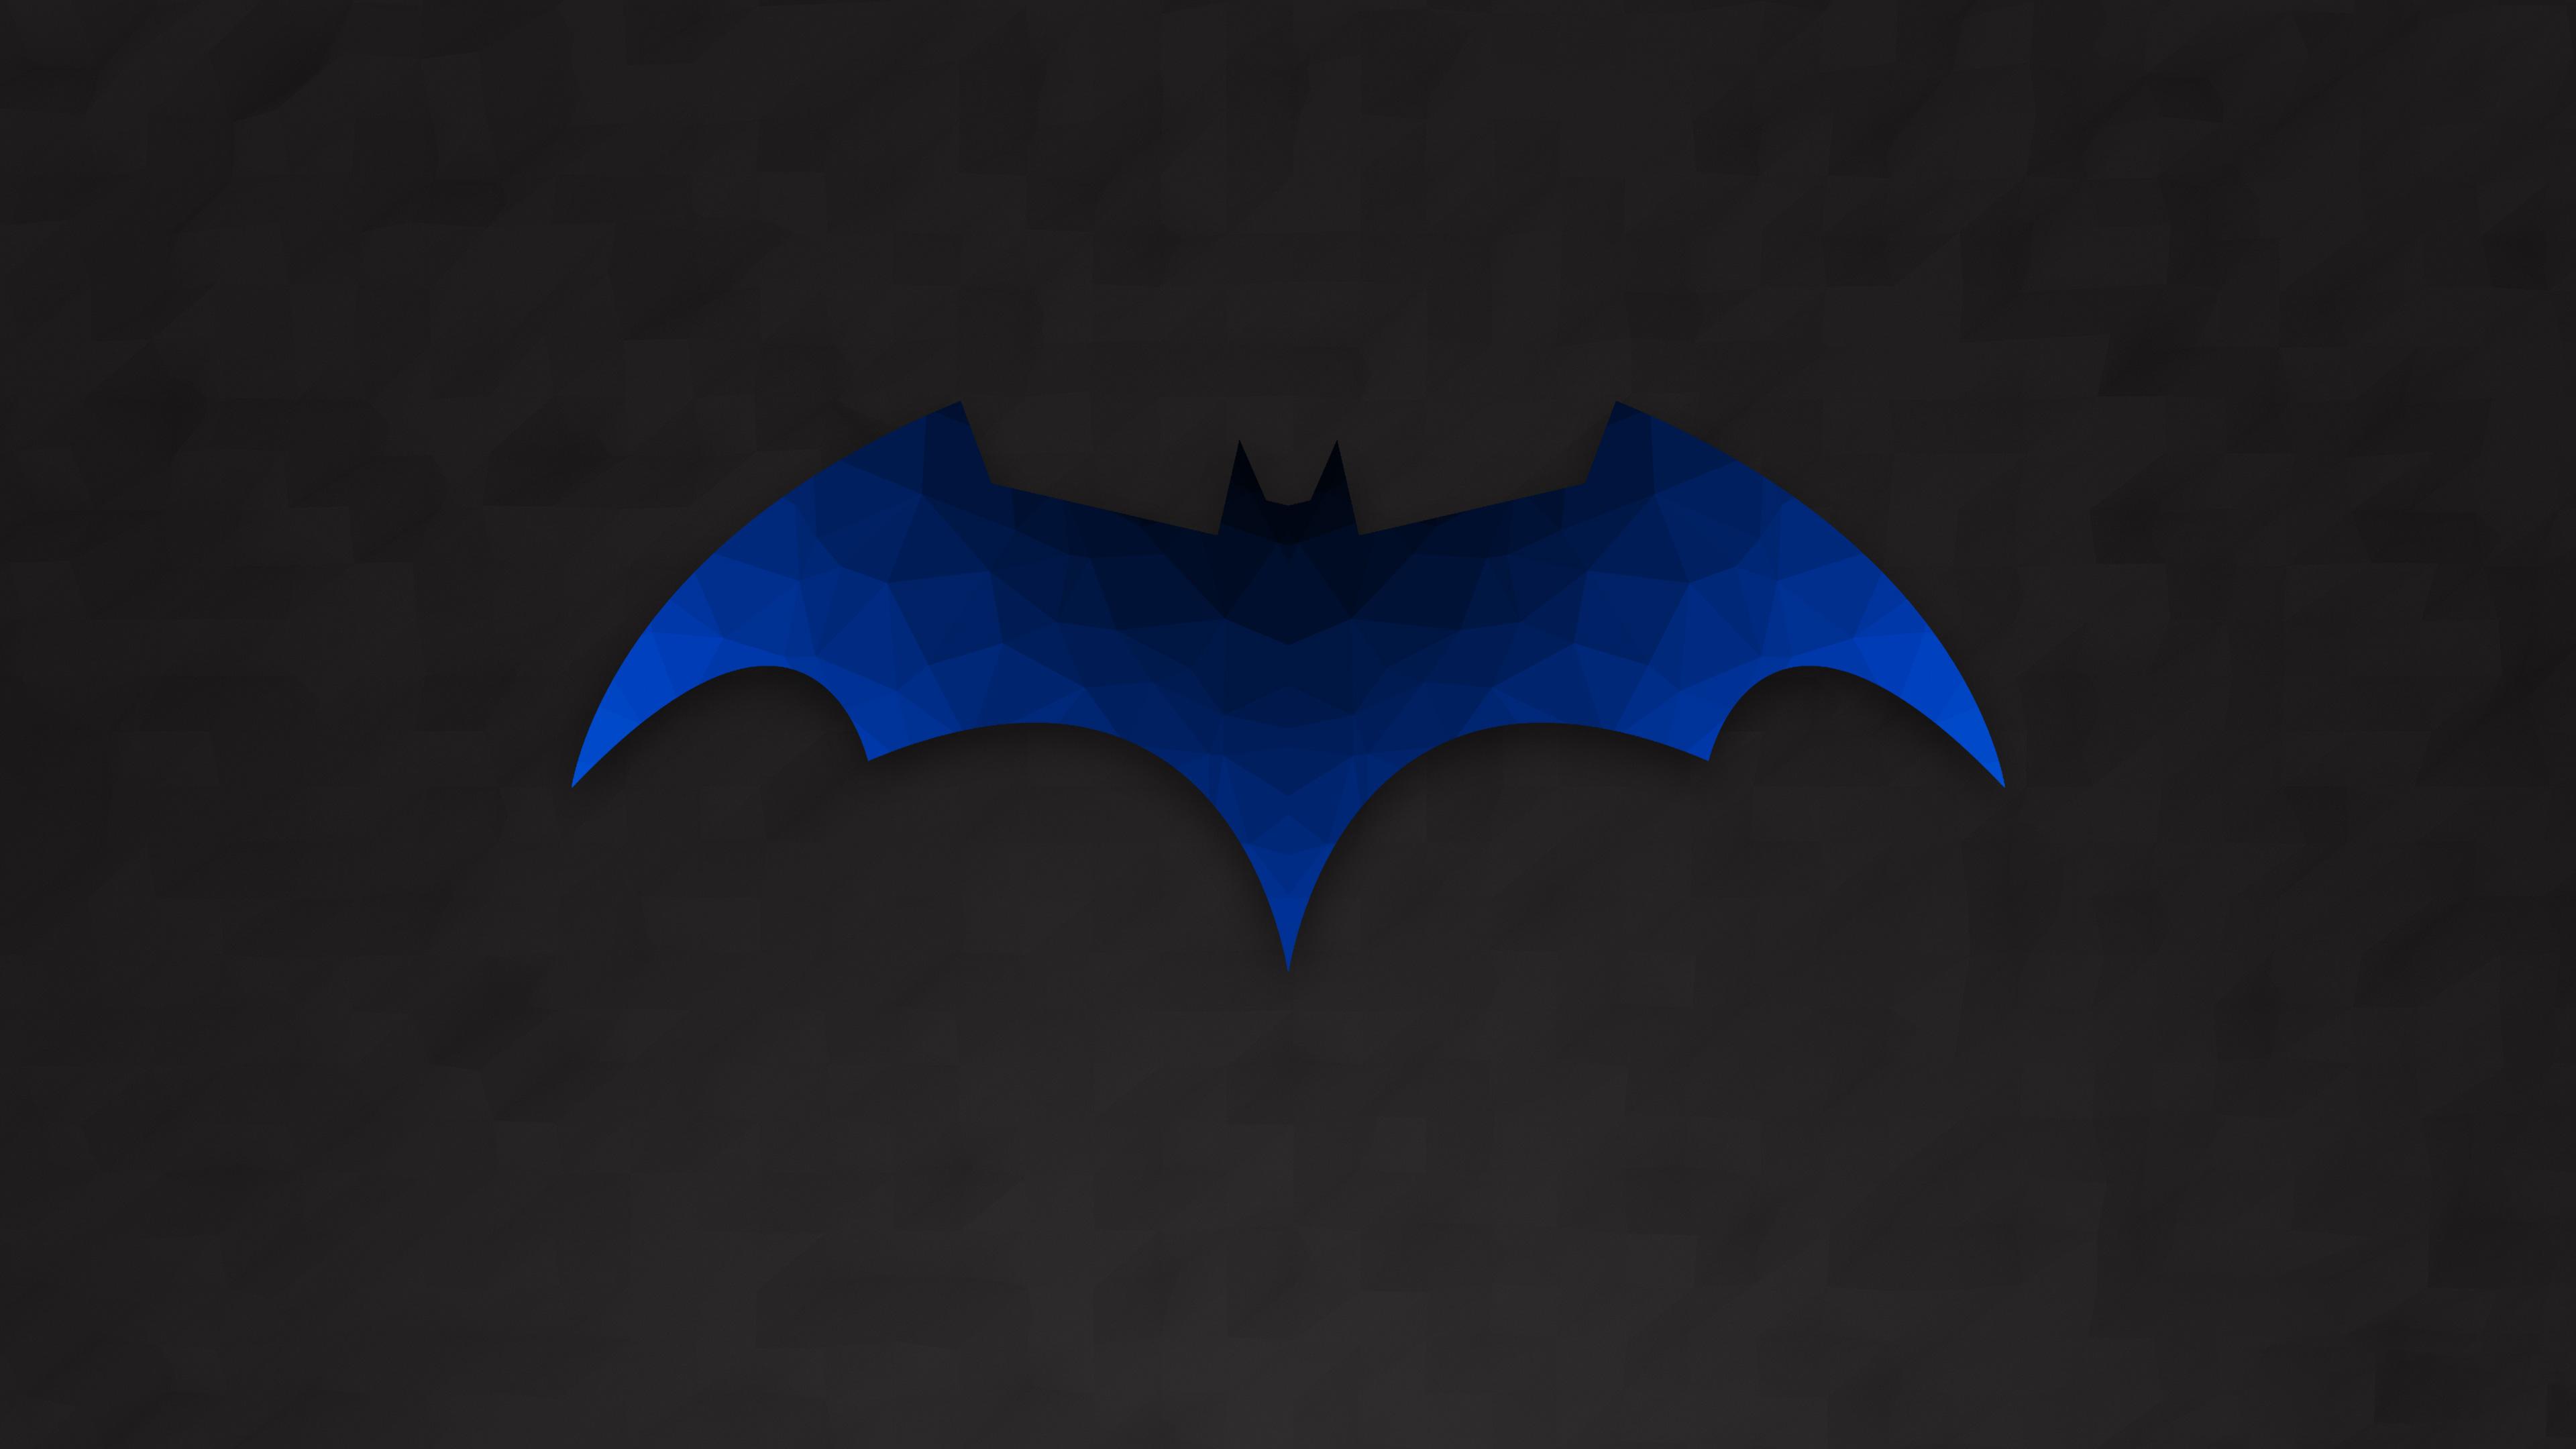 1366x768 Low Polygon Batman Logo 1366x768 Resolution HD 4k ...